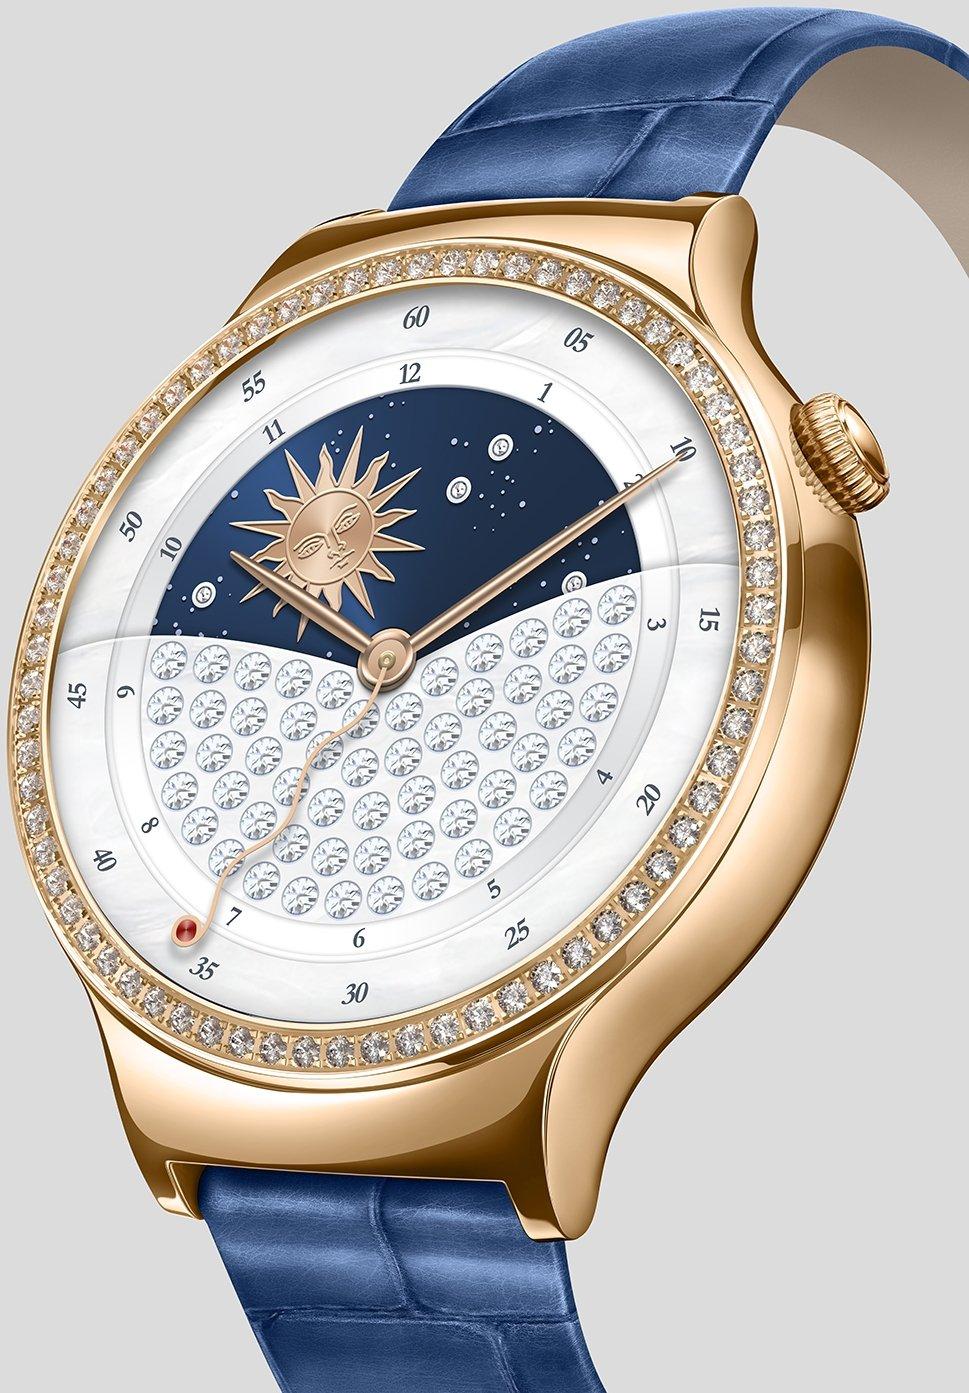 HUAWEI 55021238 Jewel Smartwatch con Piel Pulsera, Acero ...